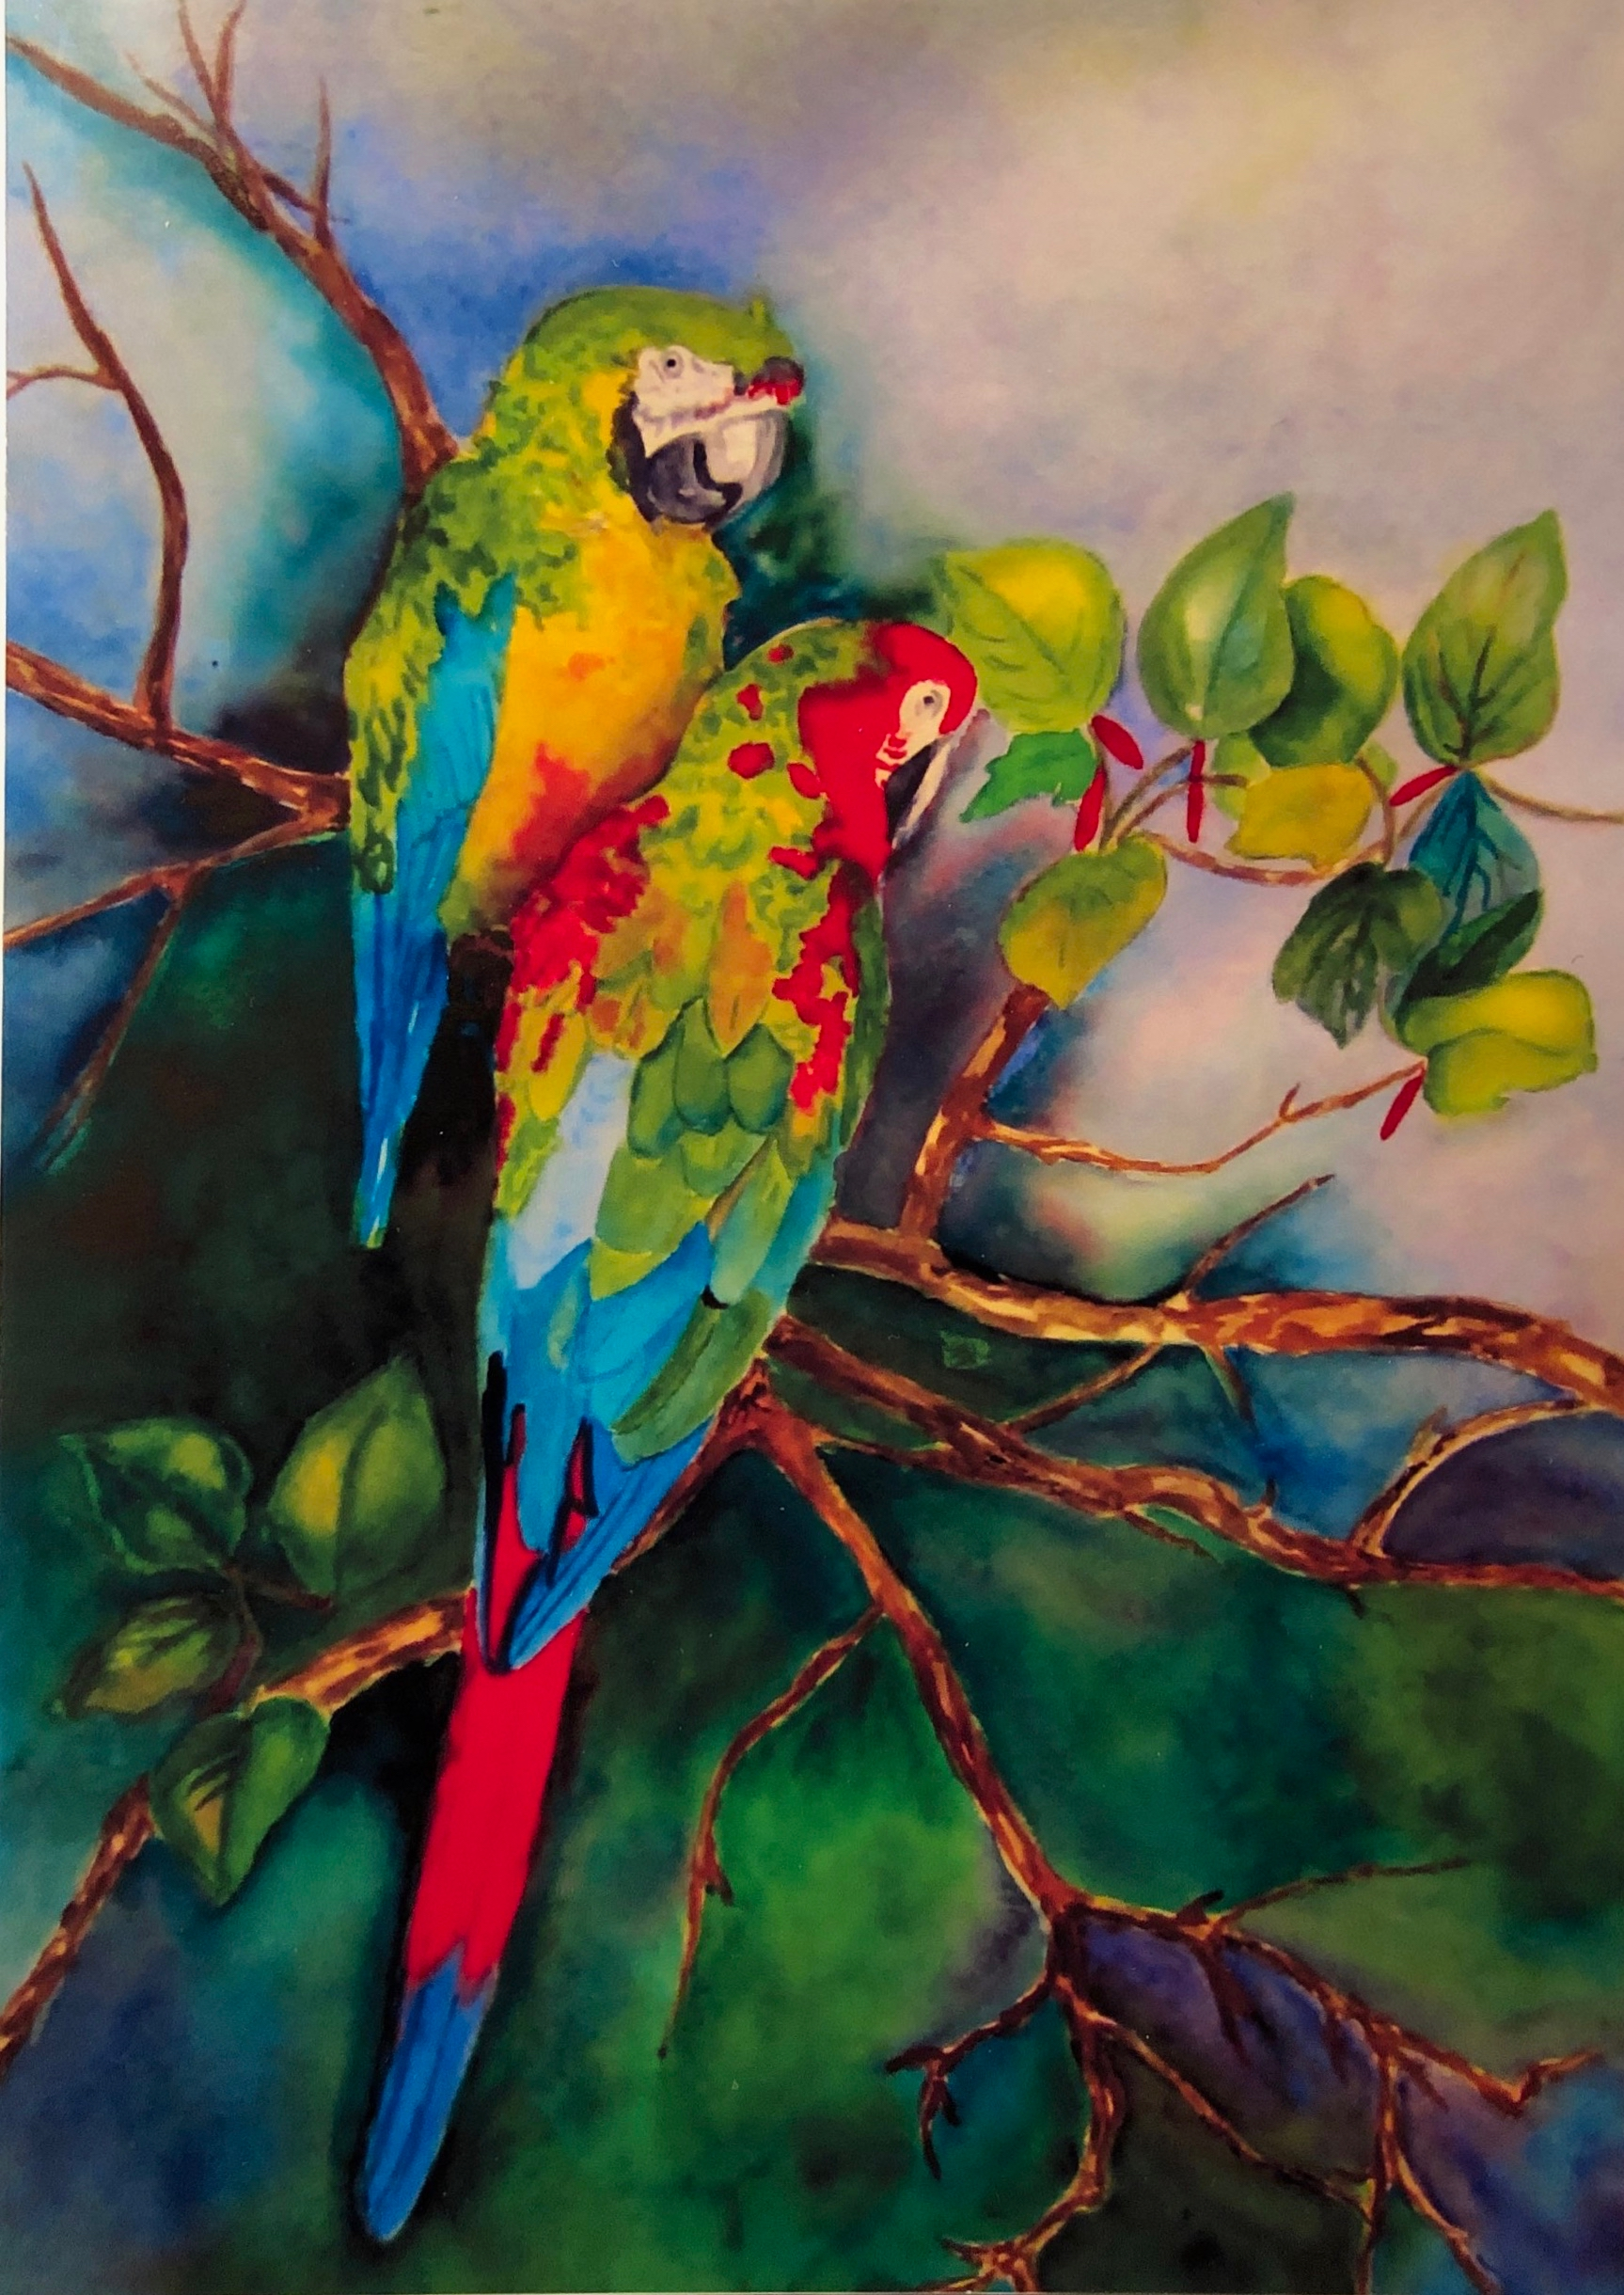 """Moody Garden McCaws"" by Lynette Bagley"